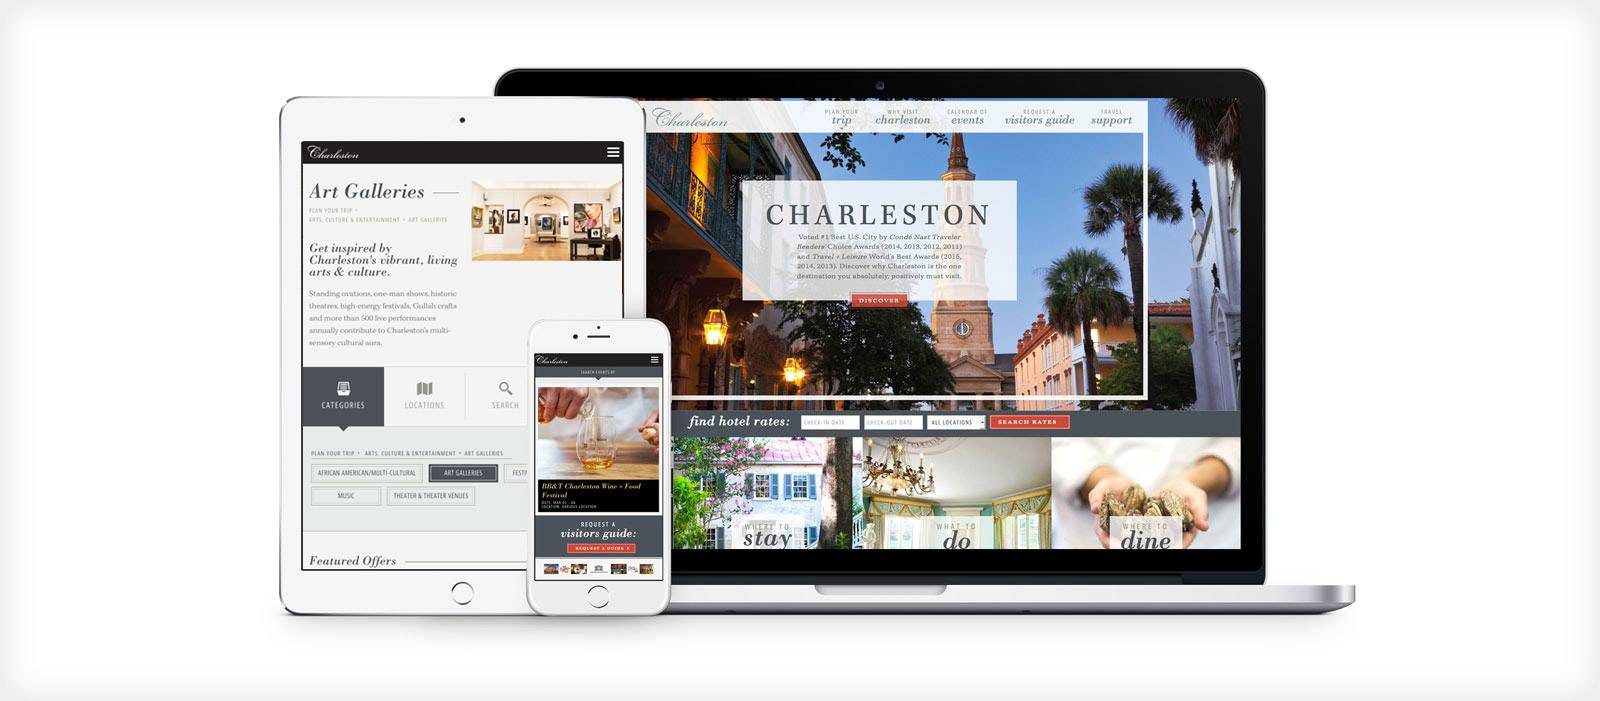 CVB Visitors Website Redesign responsive